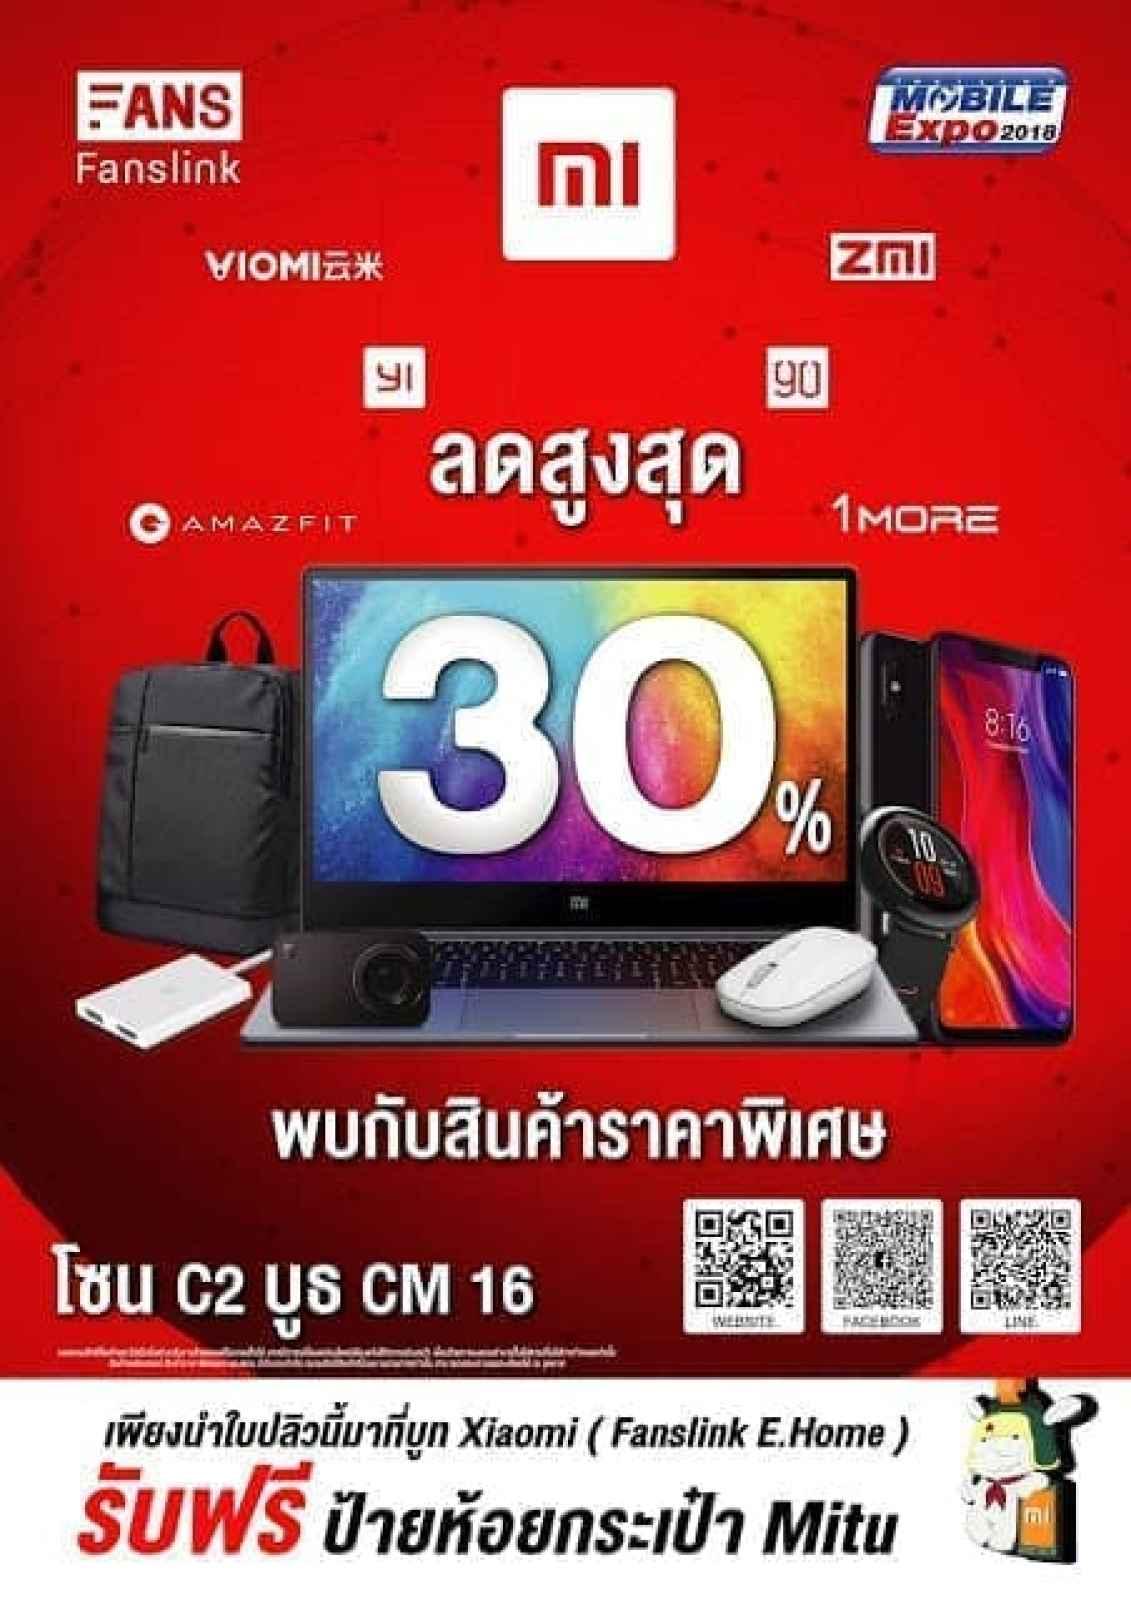 - 20180926 TME 30  2 - Mi Store by Fanslink  จัดโปรโมชั่น ลดสูงสุดถึง 30% ในงาน TME 2018